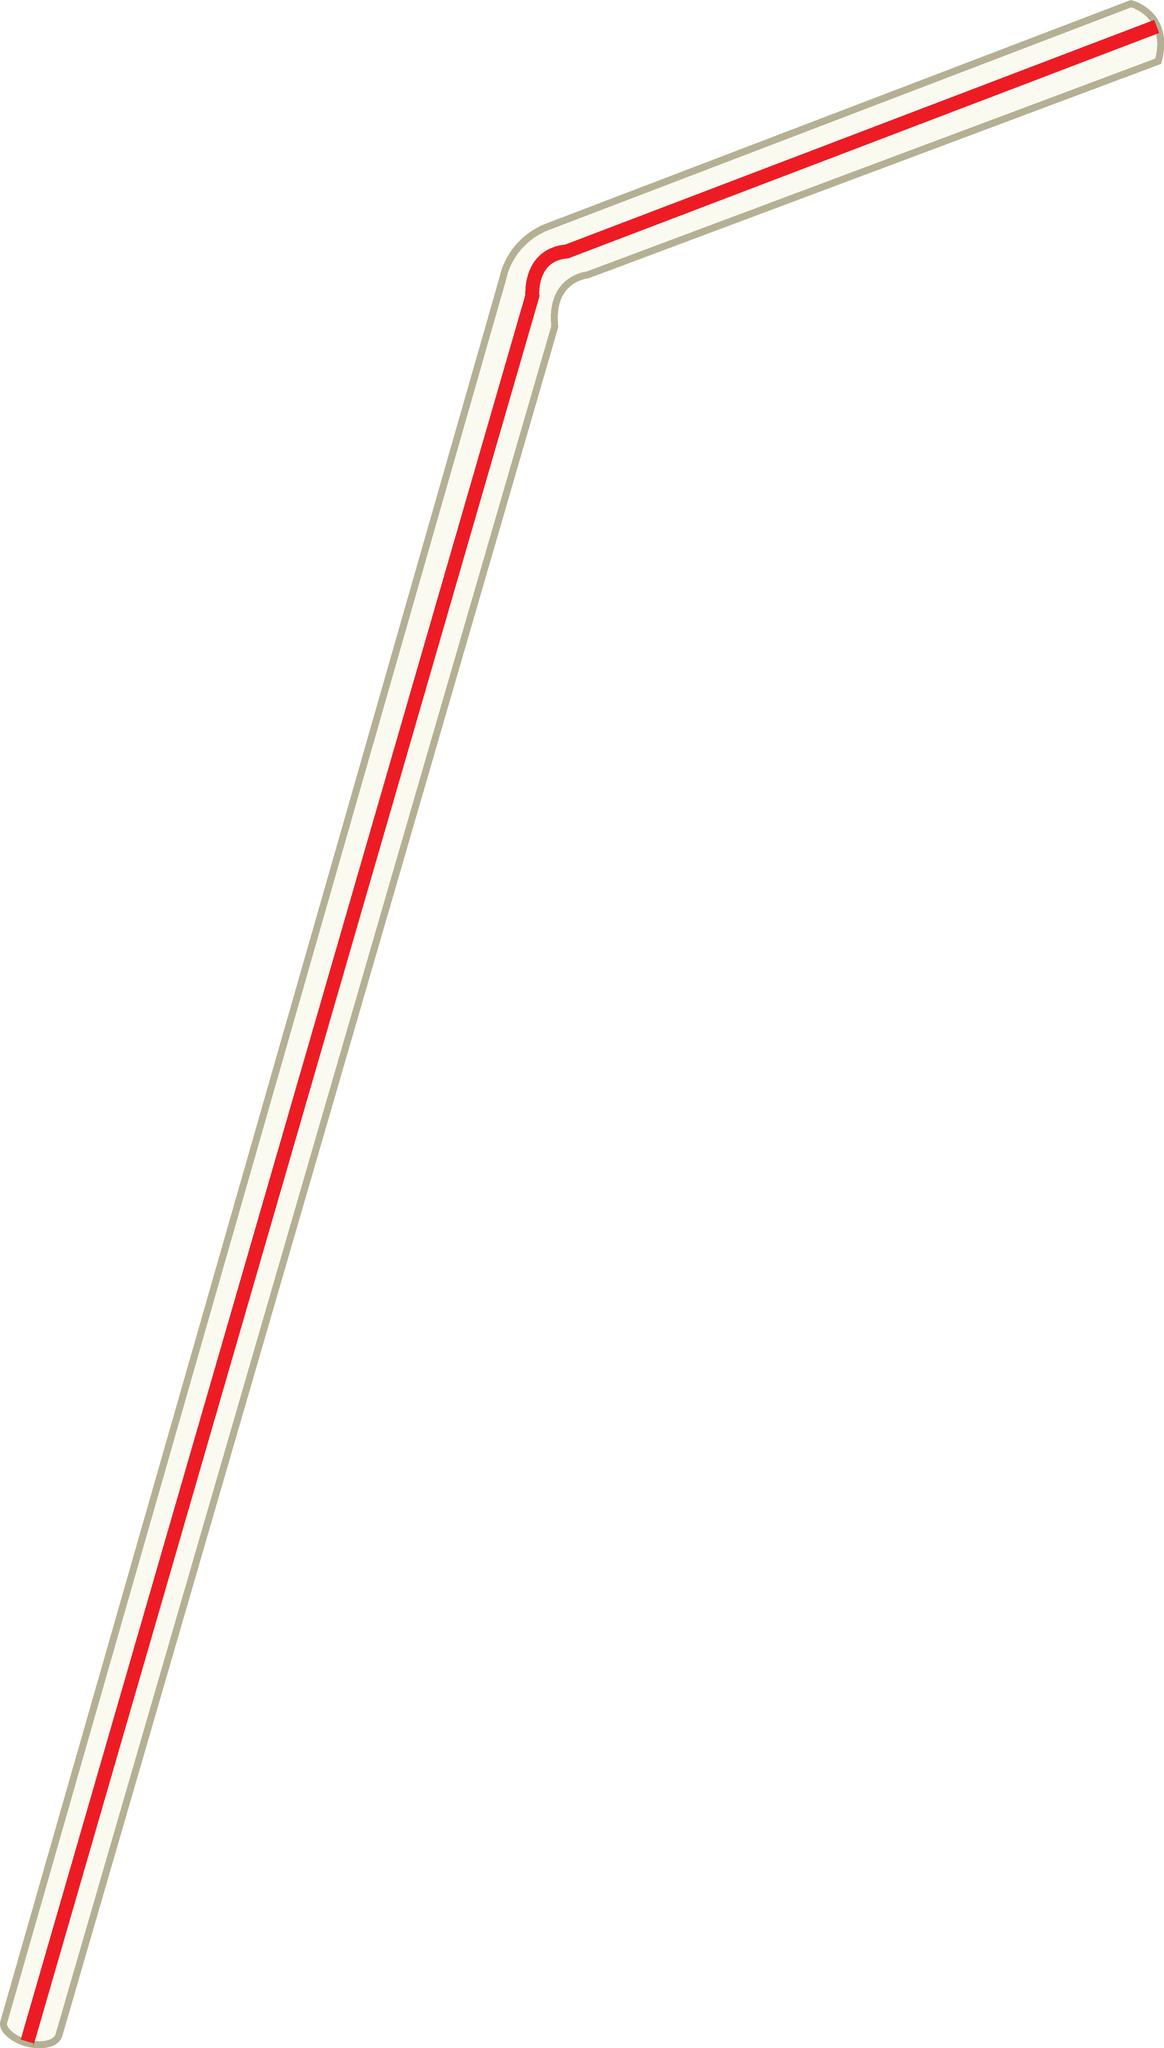 straw in spanish